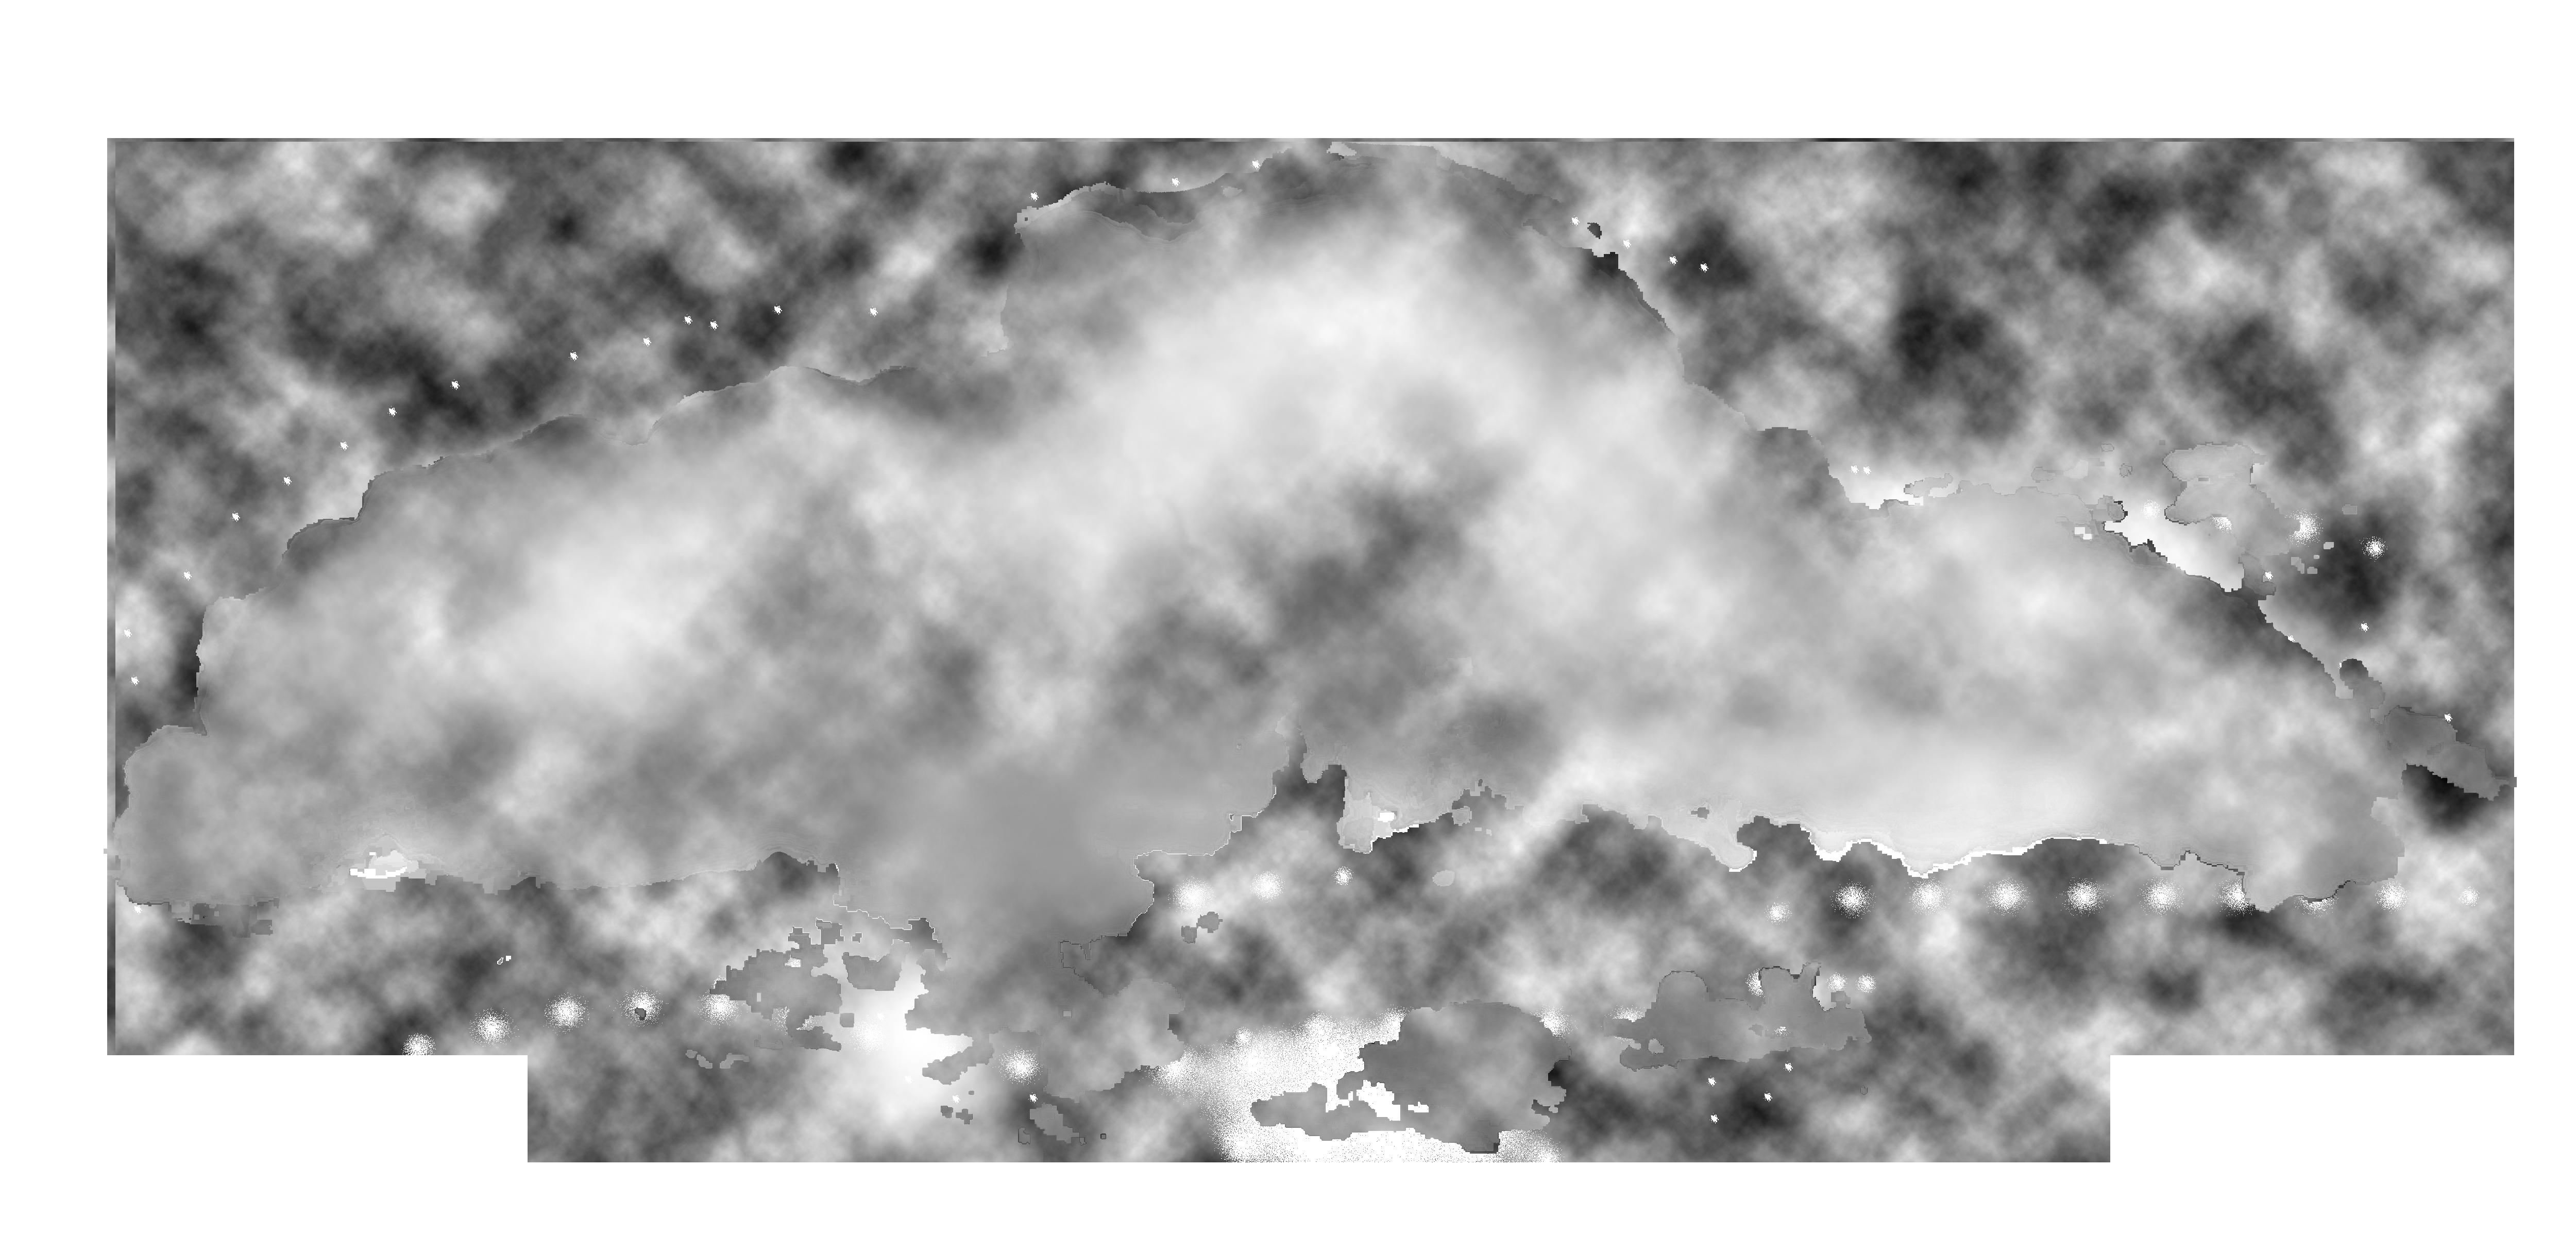 Ash Cloud clipart #8, Download drawings